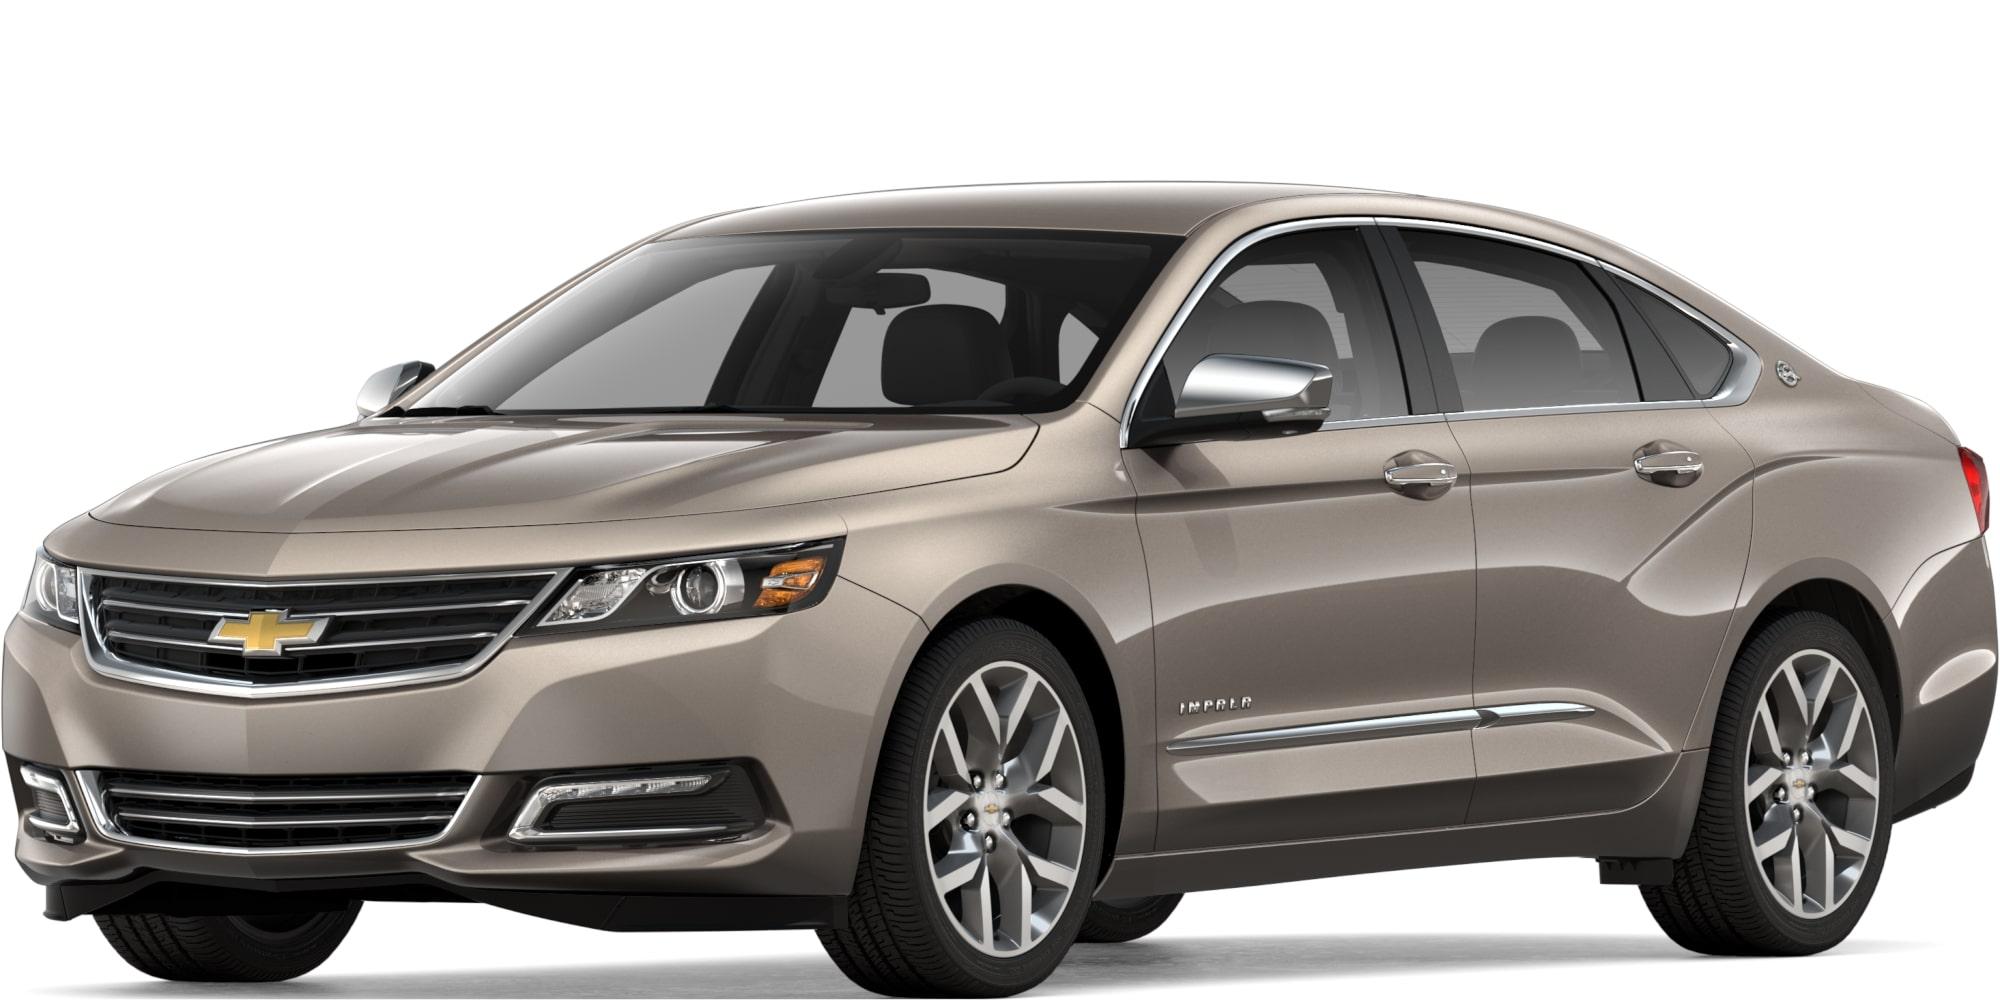 New 12222 Chevrolet Impala for Sale at Earnhardt Chevrolet in Chandler, AZ